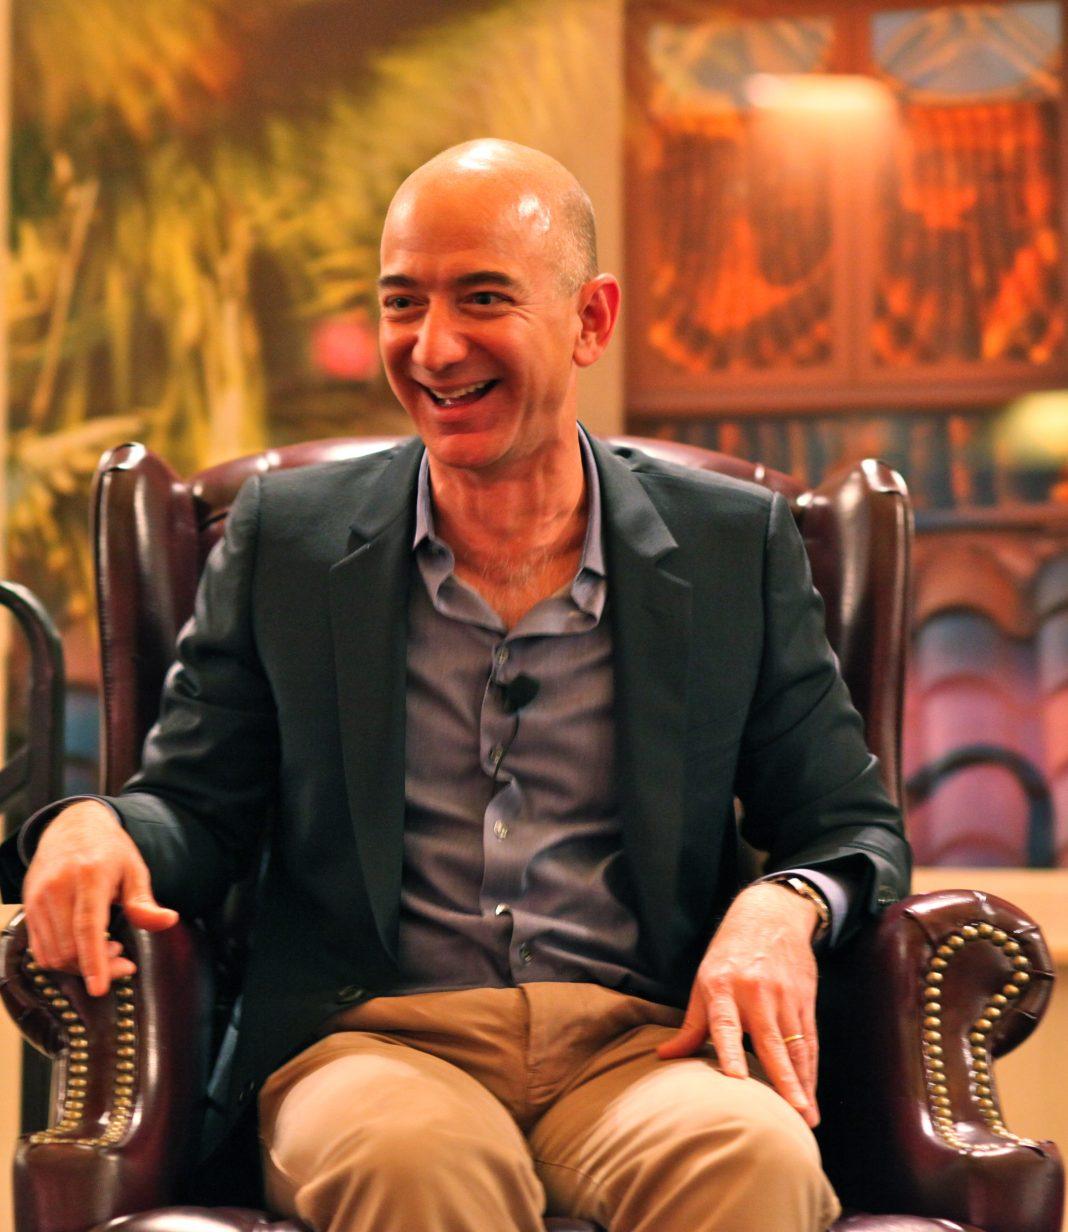 Jeff_Bezos'_iconic_laugh.jpg